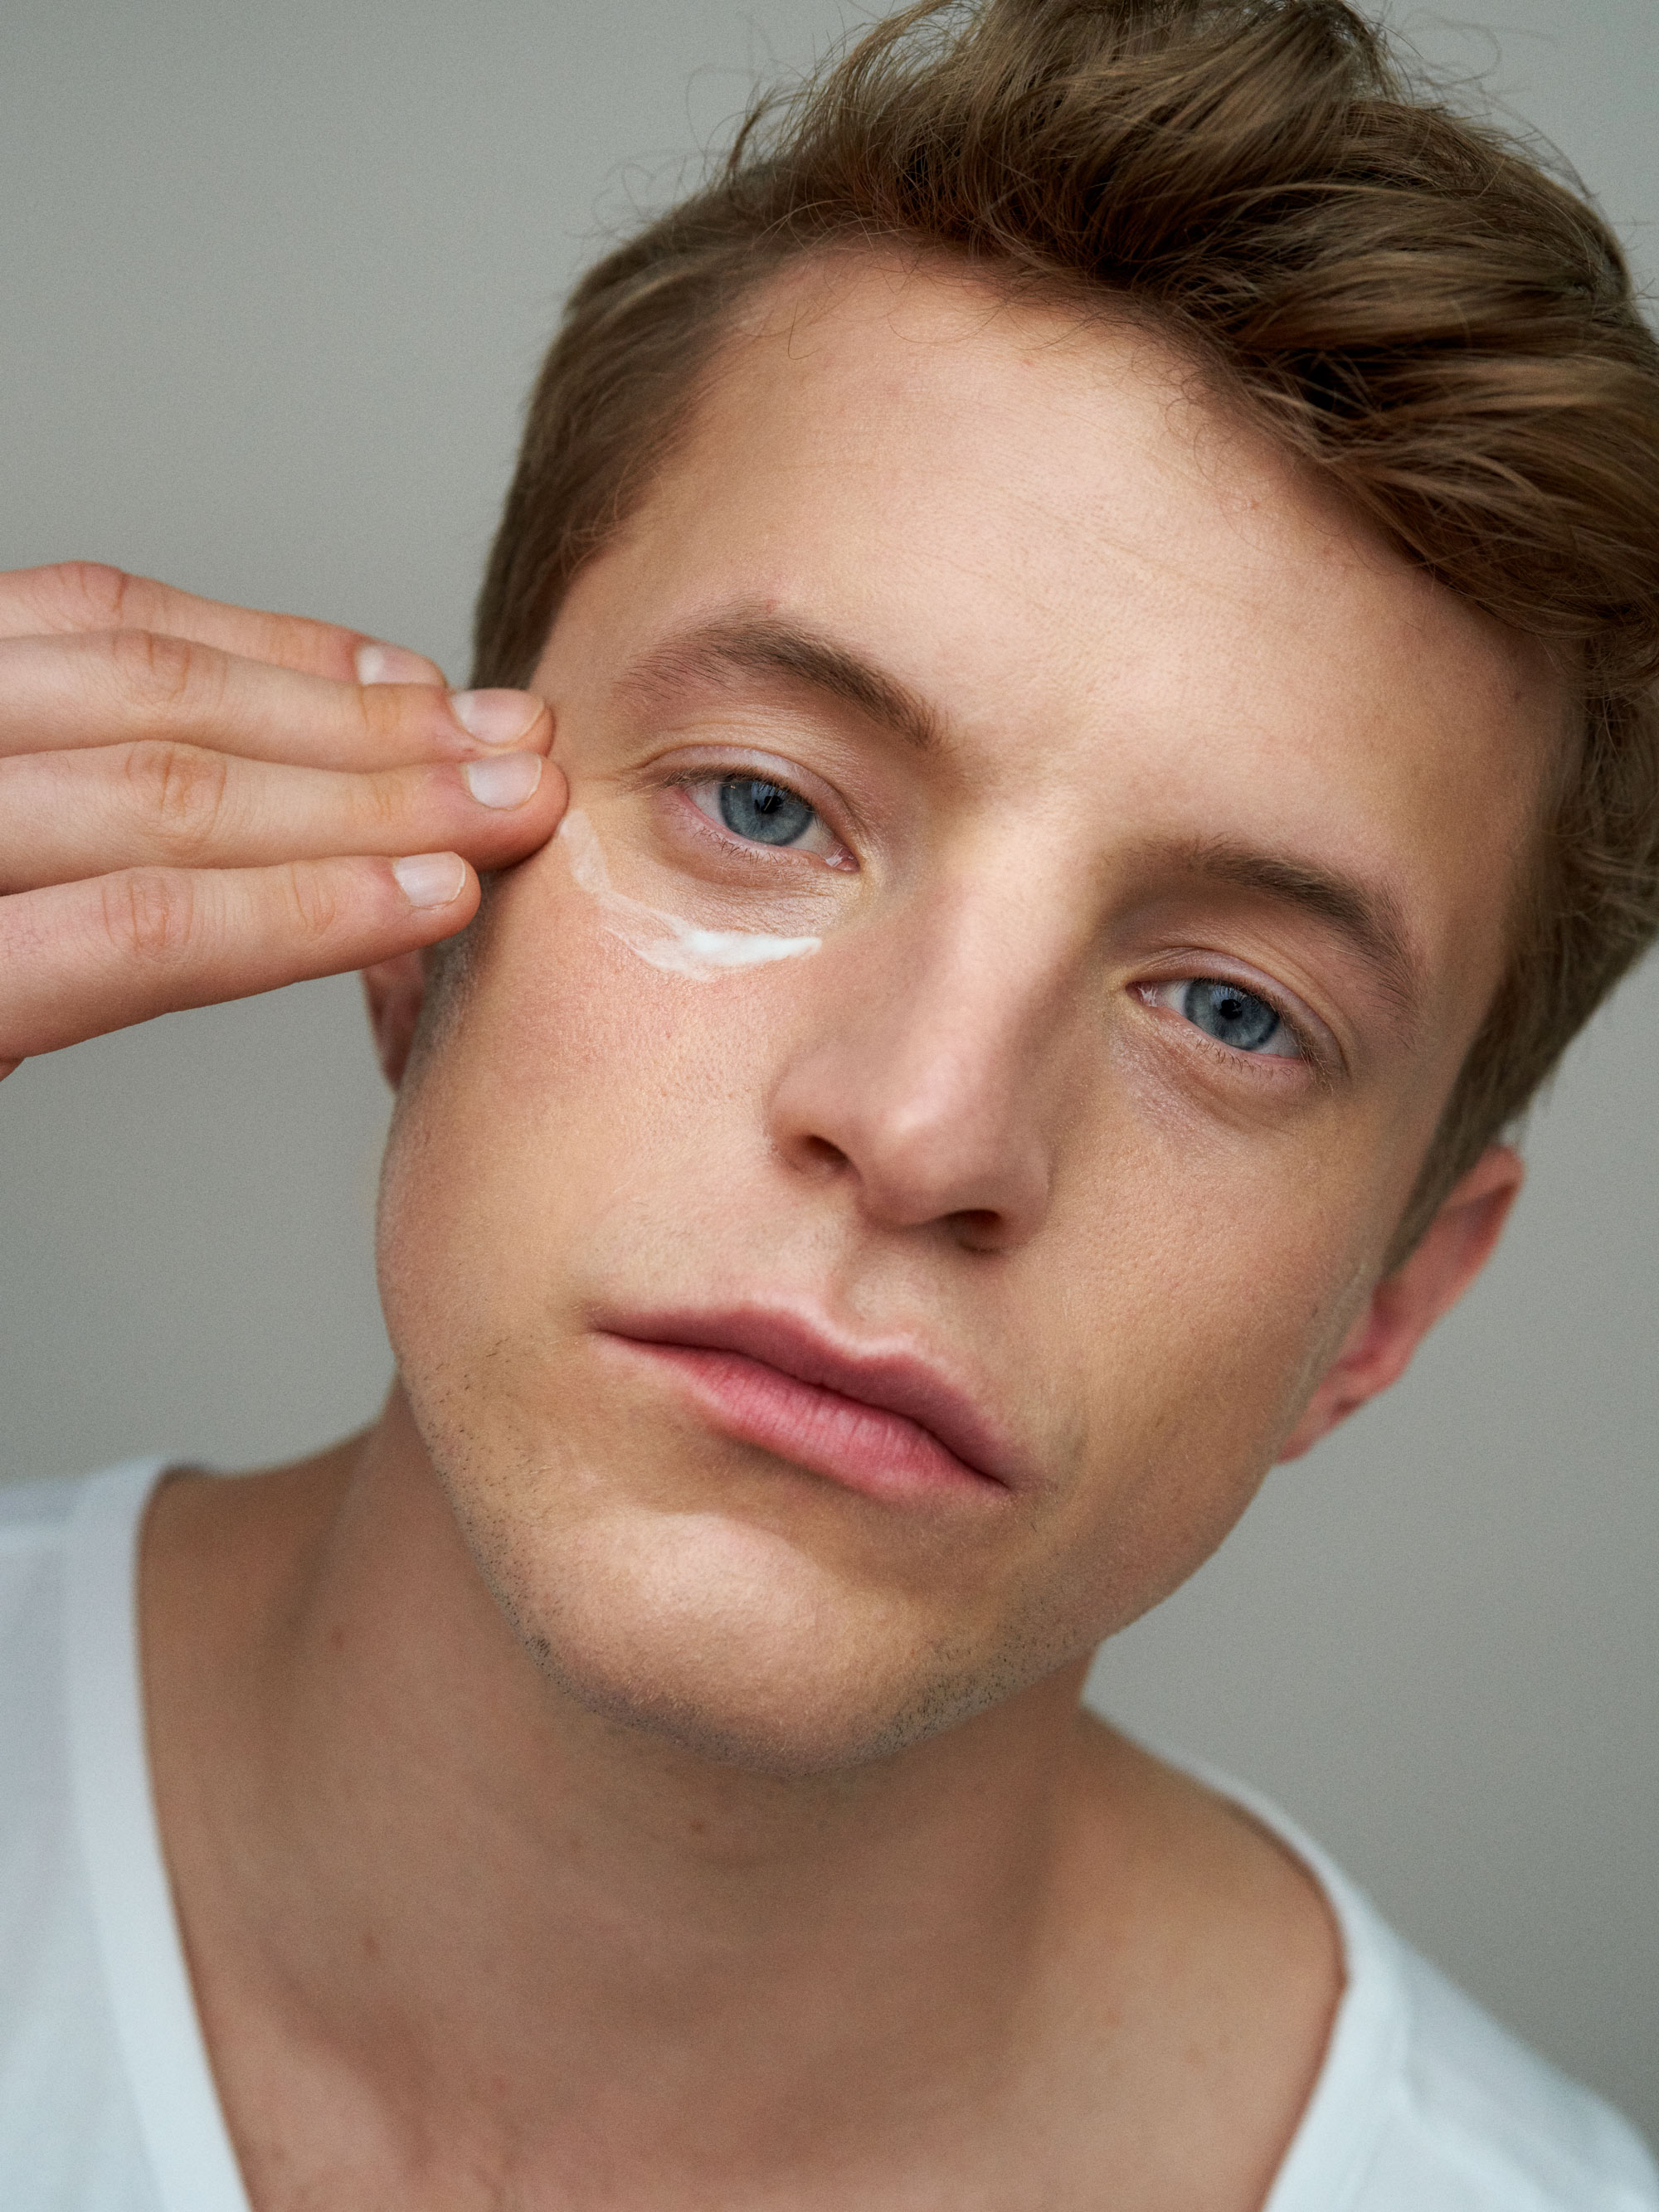 versoskincare - Verso Eye Cream